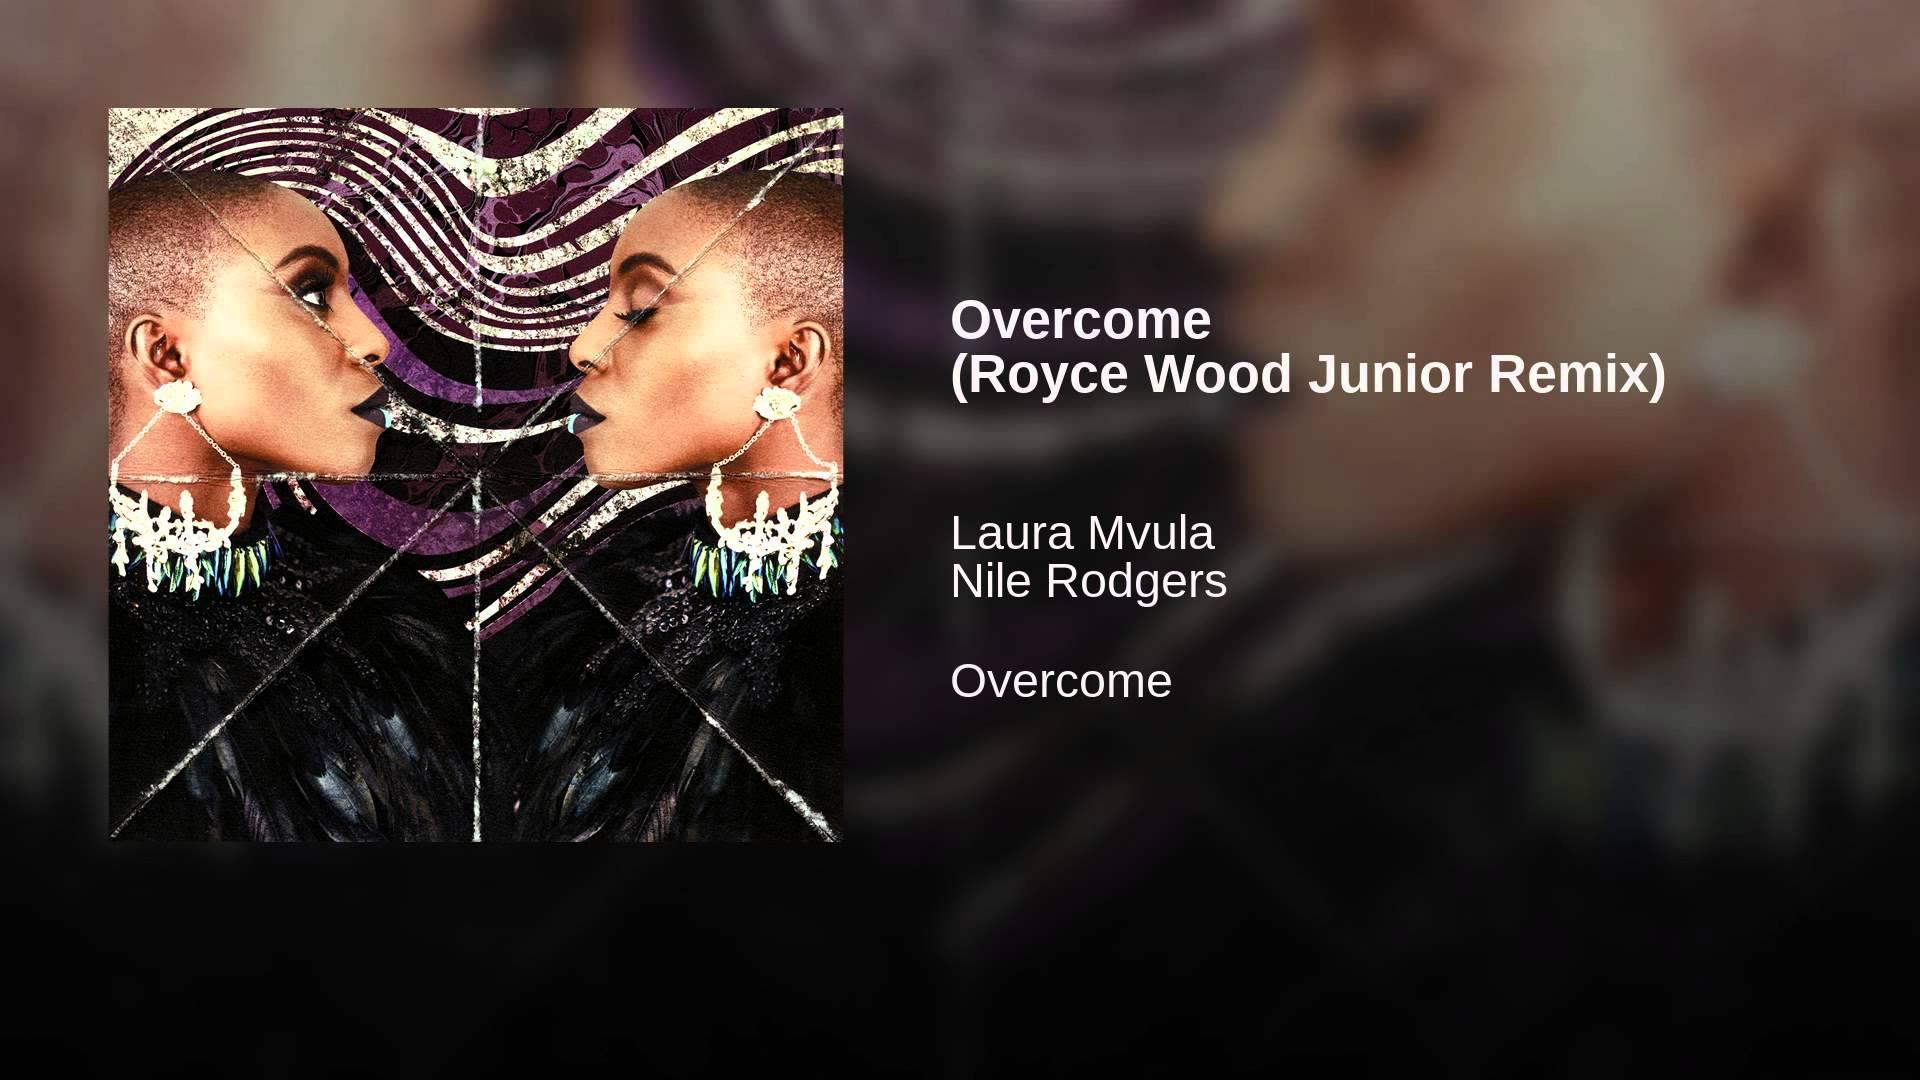 Laura Mvula – Overcome (Royce Wood Junior Remix)